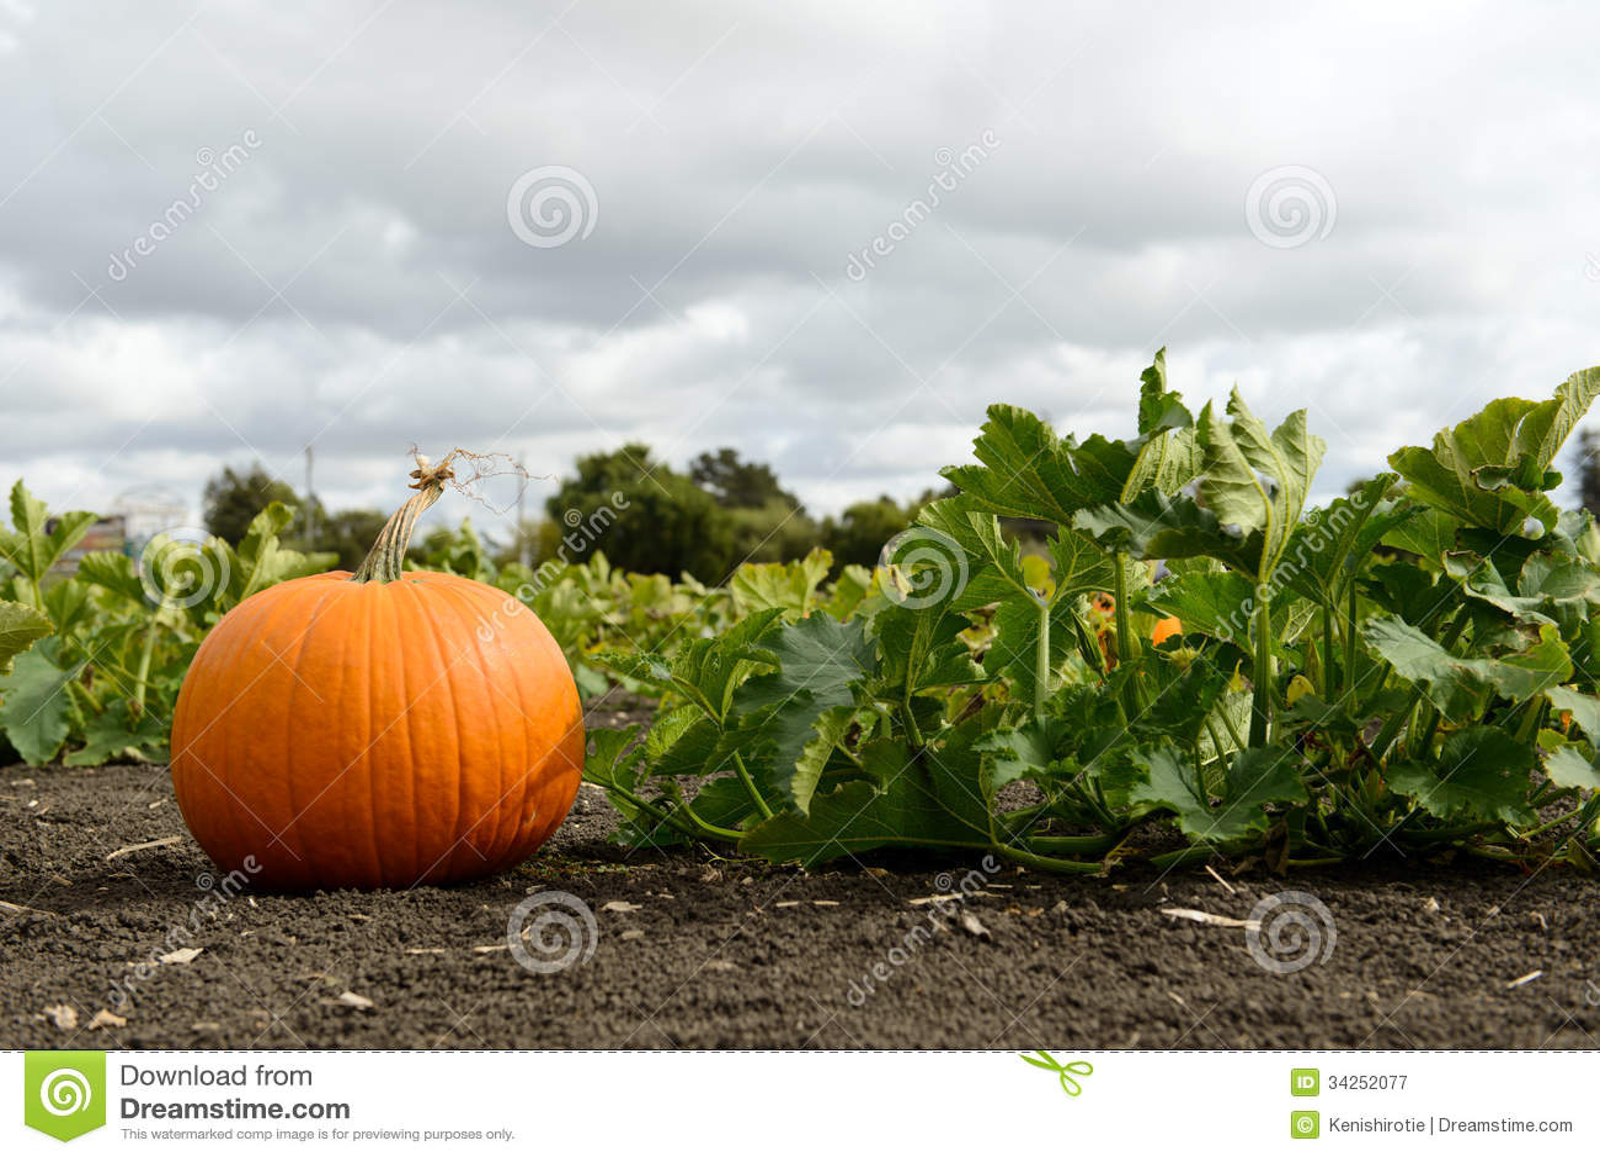 Pumkin Patch Stock Image. Image Of Field, Farm, Produce